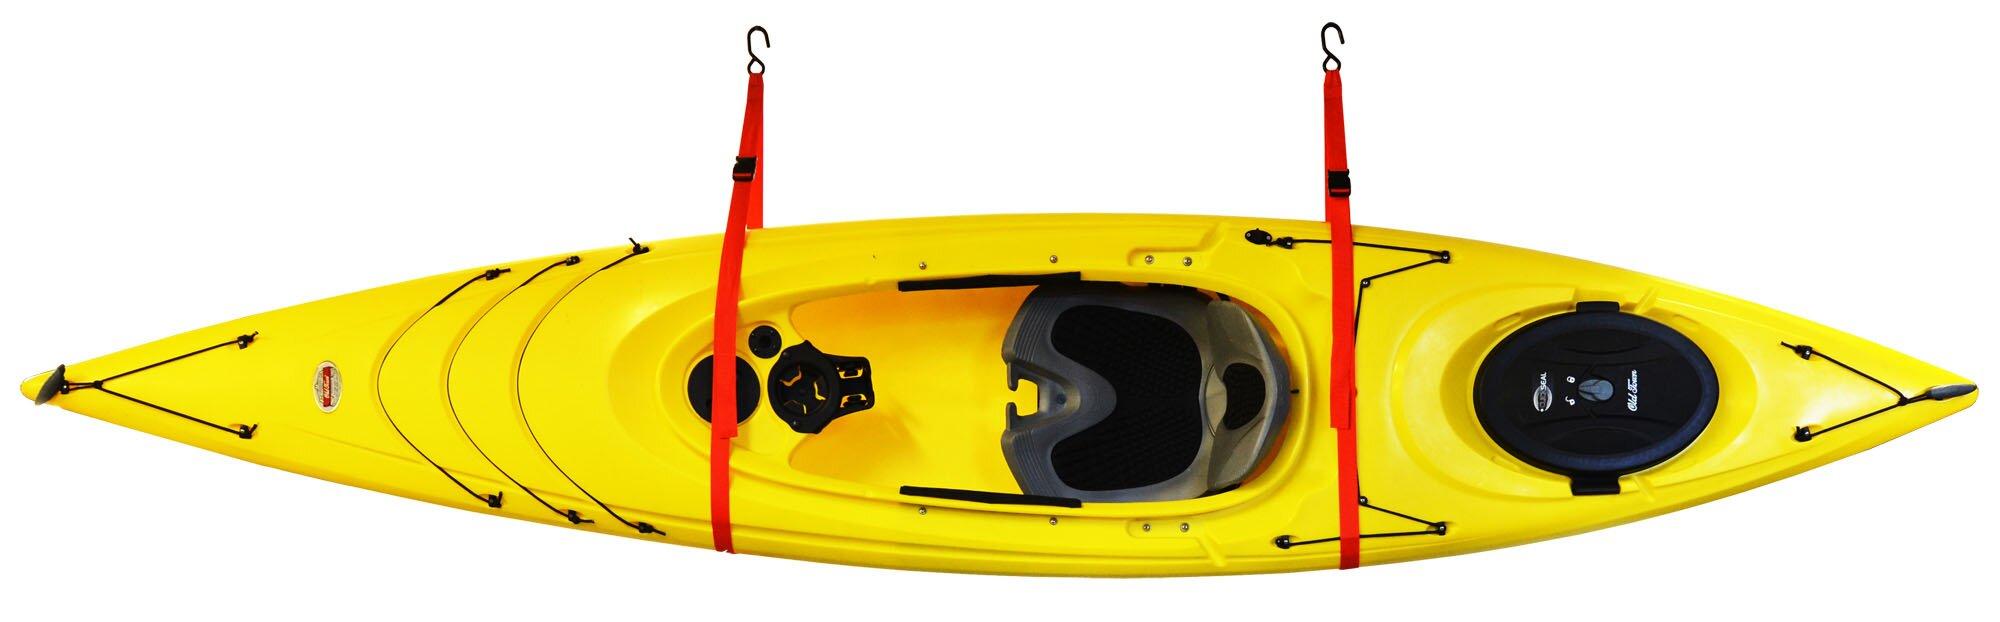 SlingOne™ Single Kayak Storage System Ceiling/Wall Mounted Kayak Rack